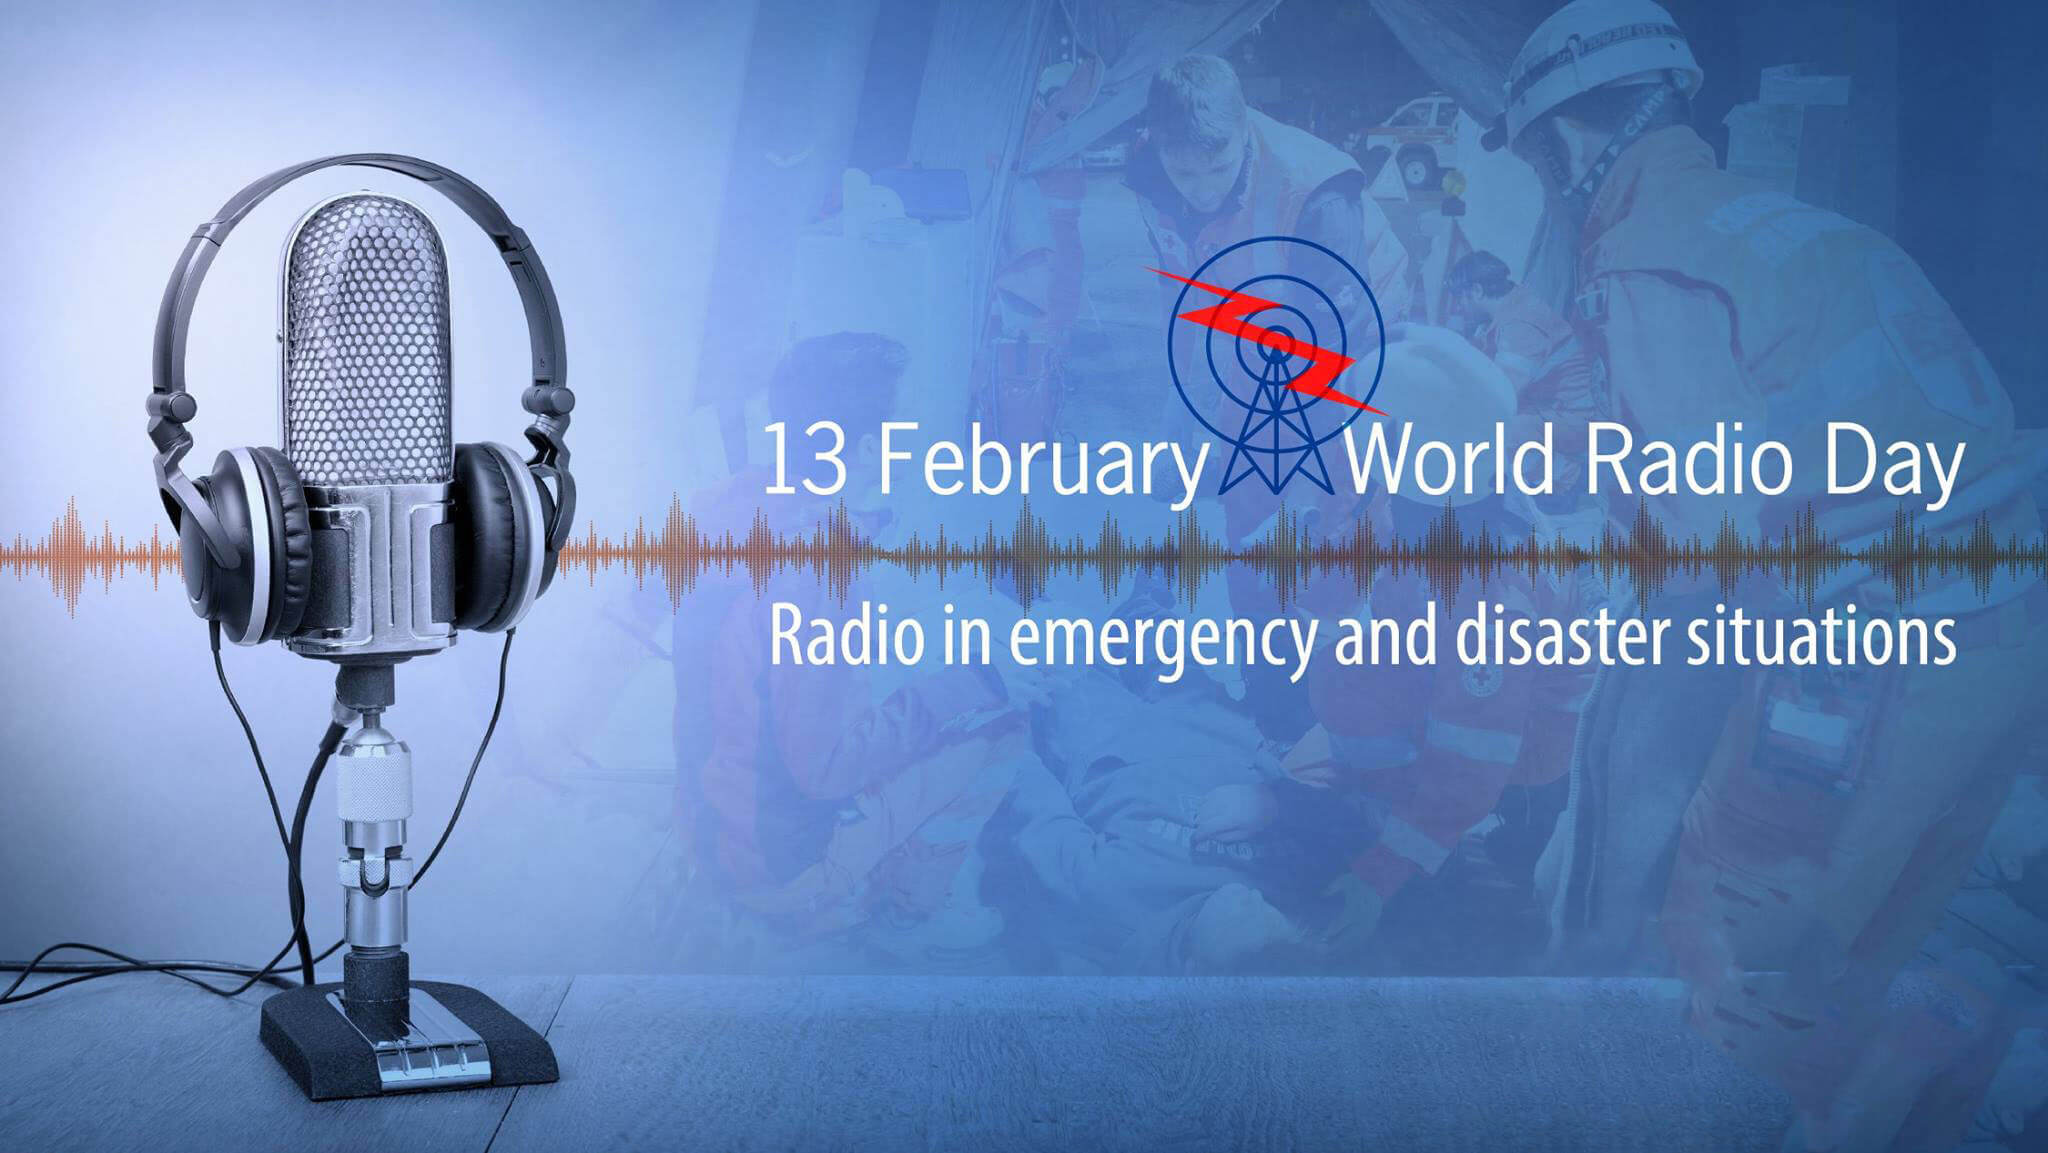 world radio day new wide desktop background hd wallpaper